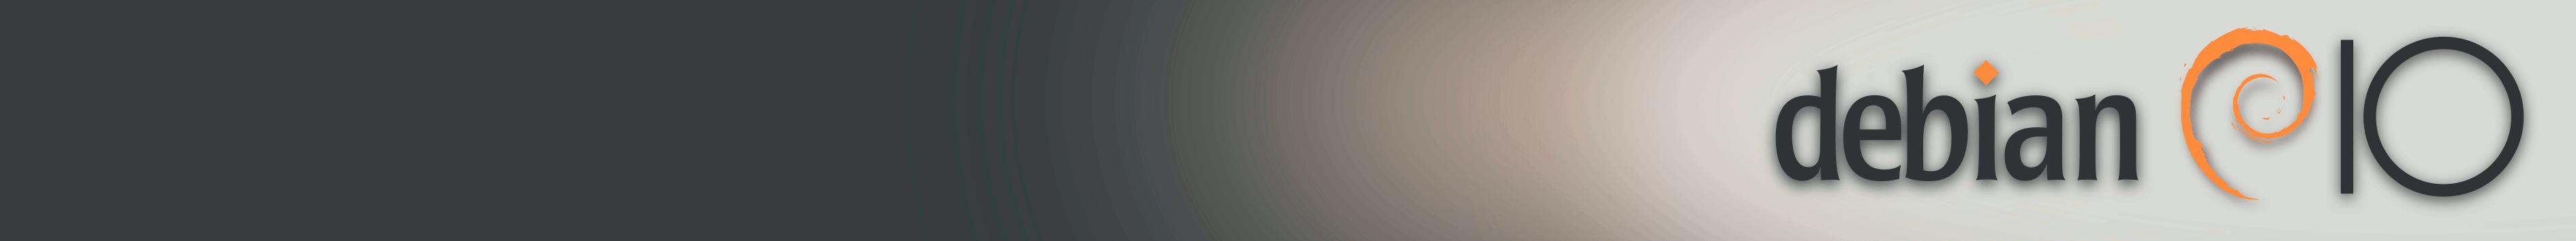 png/800x75-banner-installer-2-16bit.png